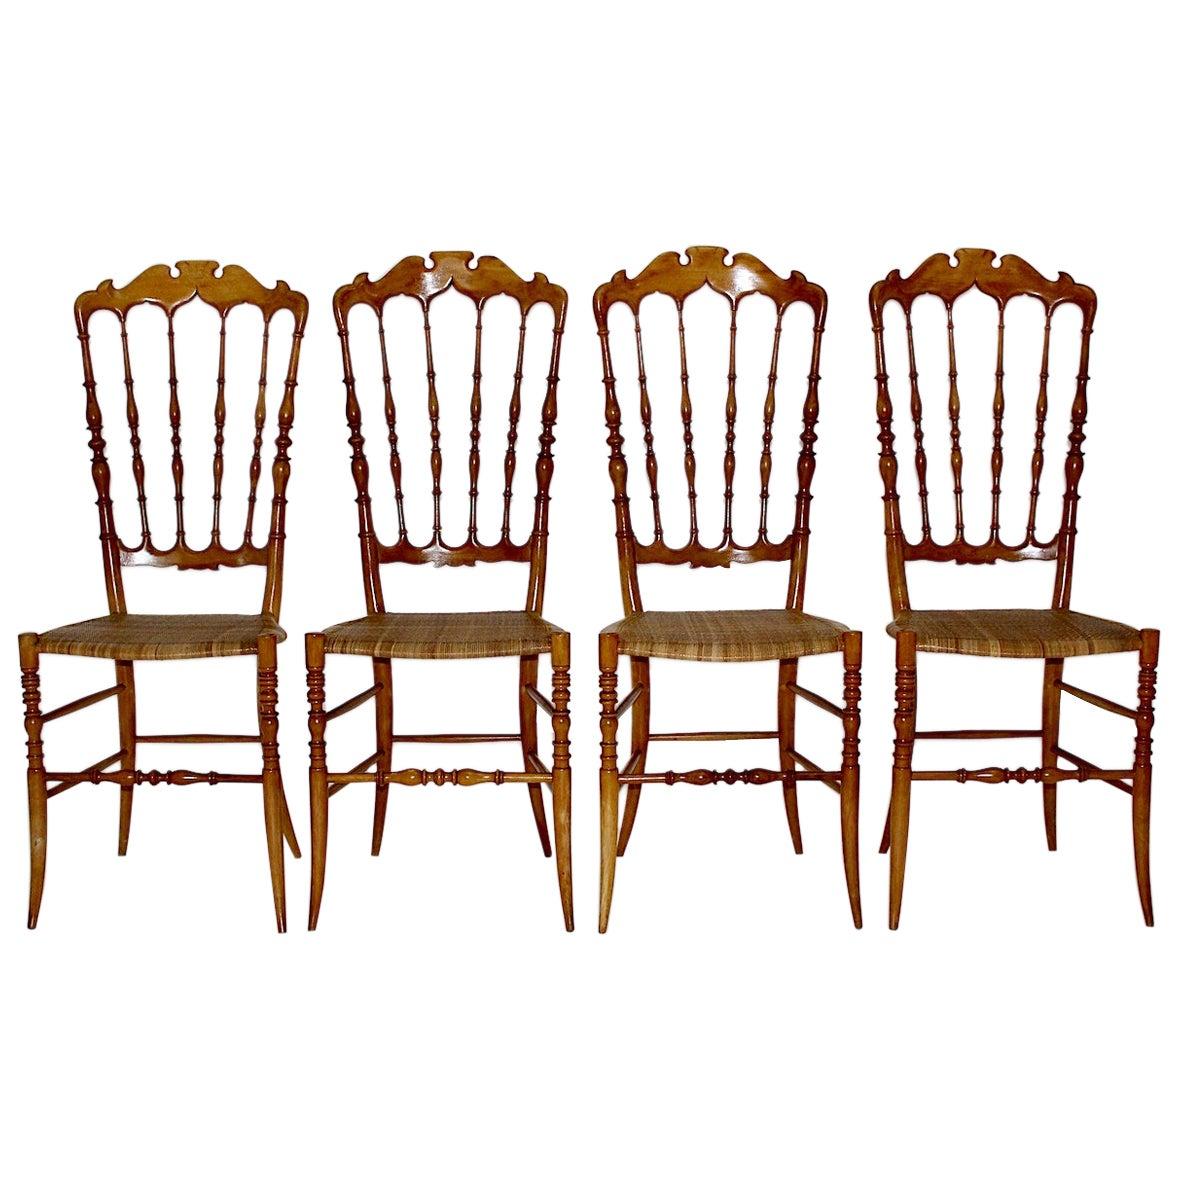 Mid-Century Modern Vintage Set of Four Beech Chiavari Dining Chairs, 1950s